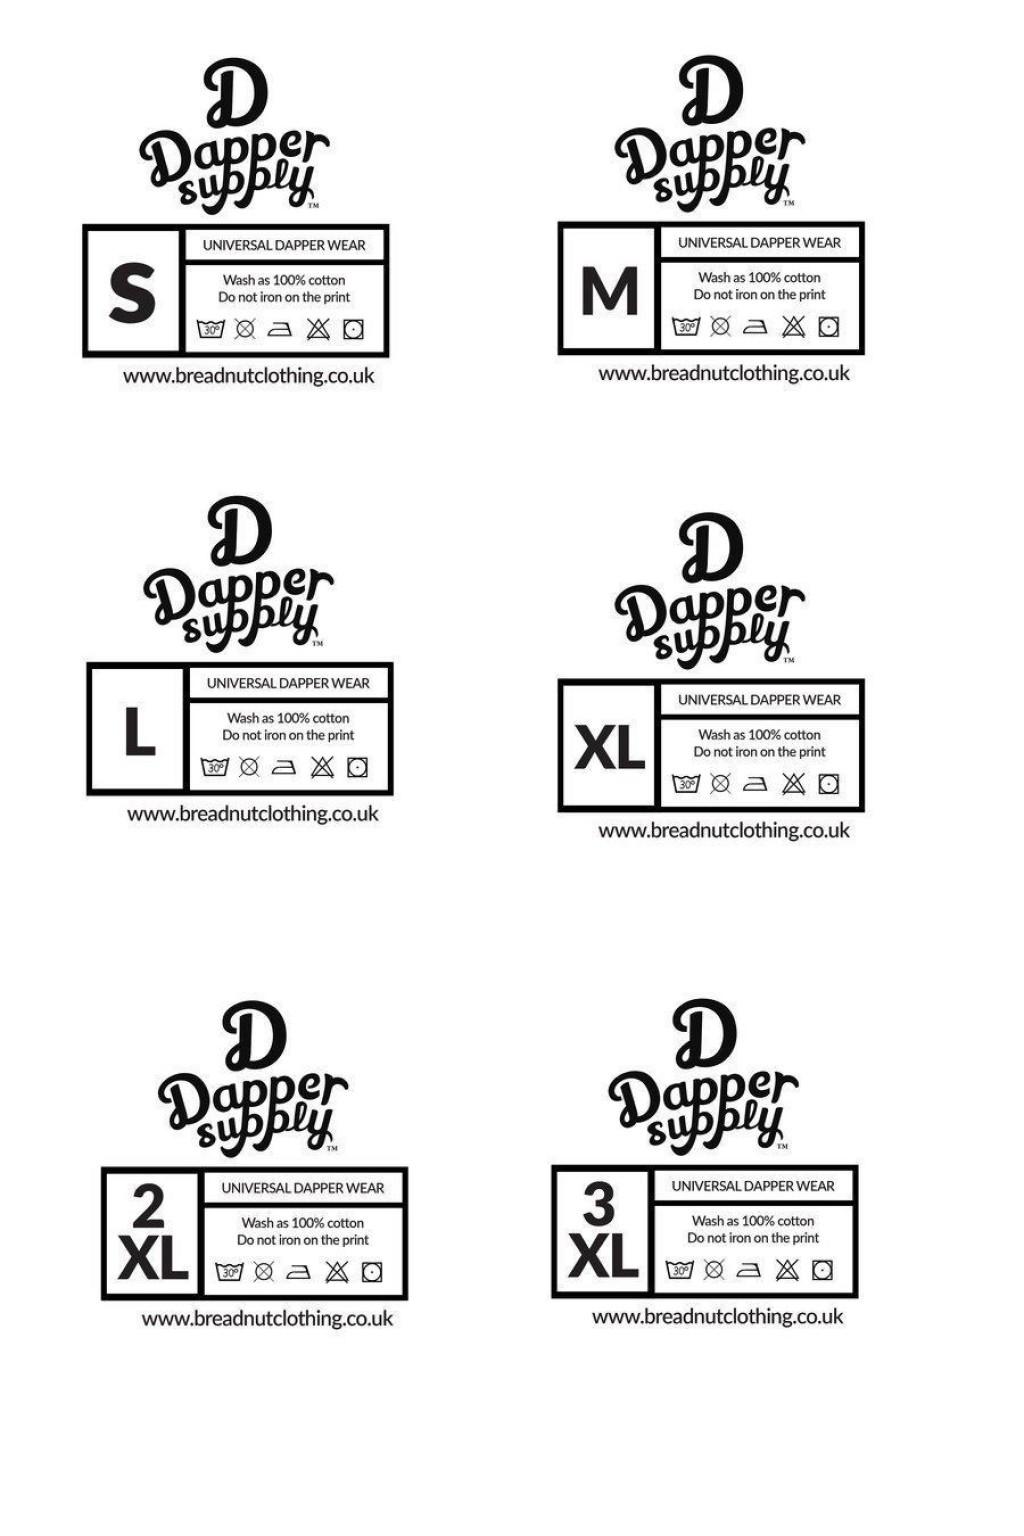 007 Fantastic Free Clothing Label Design Template Sample  Templates DownloadLarge